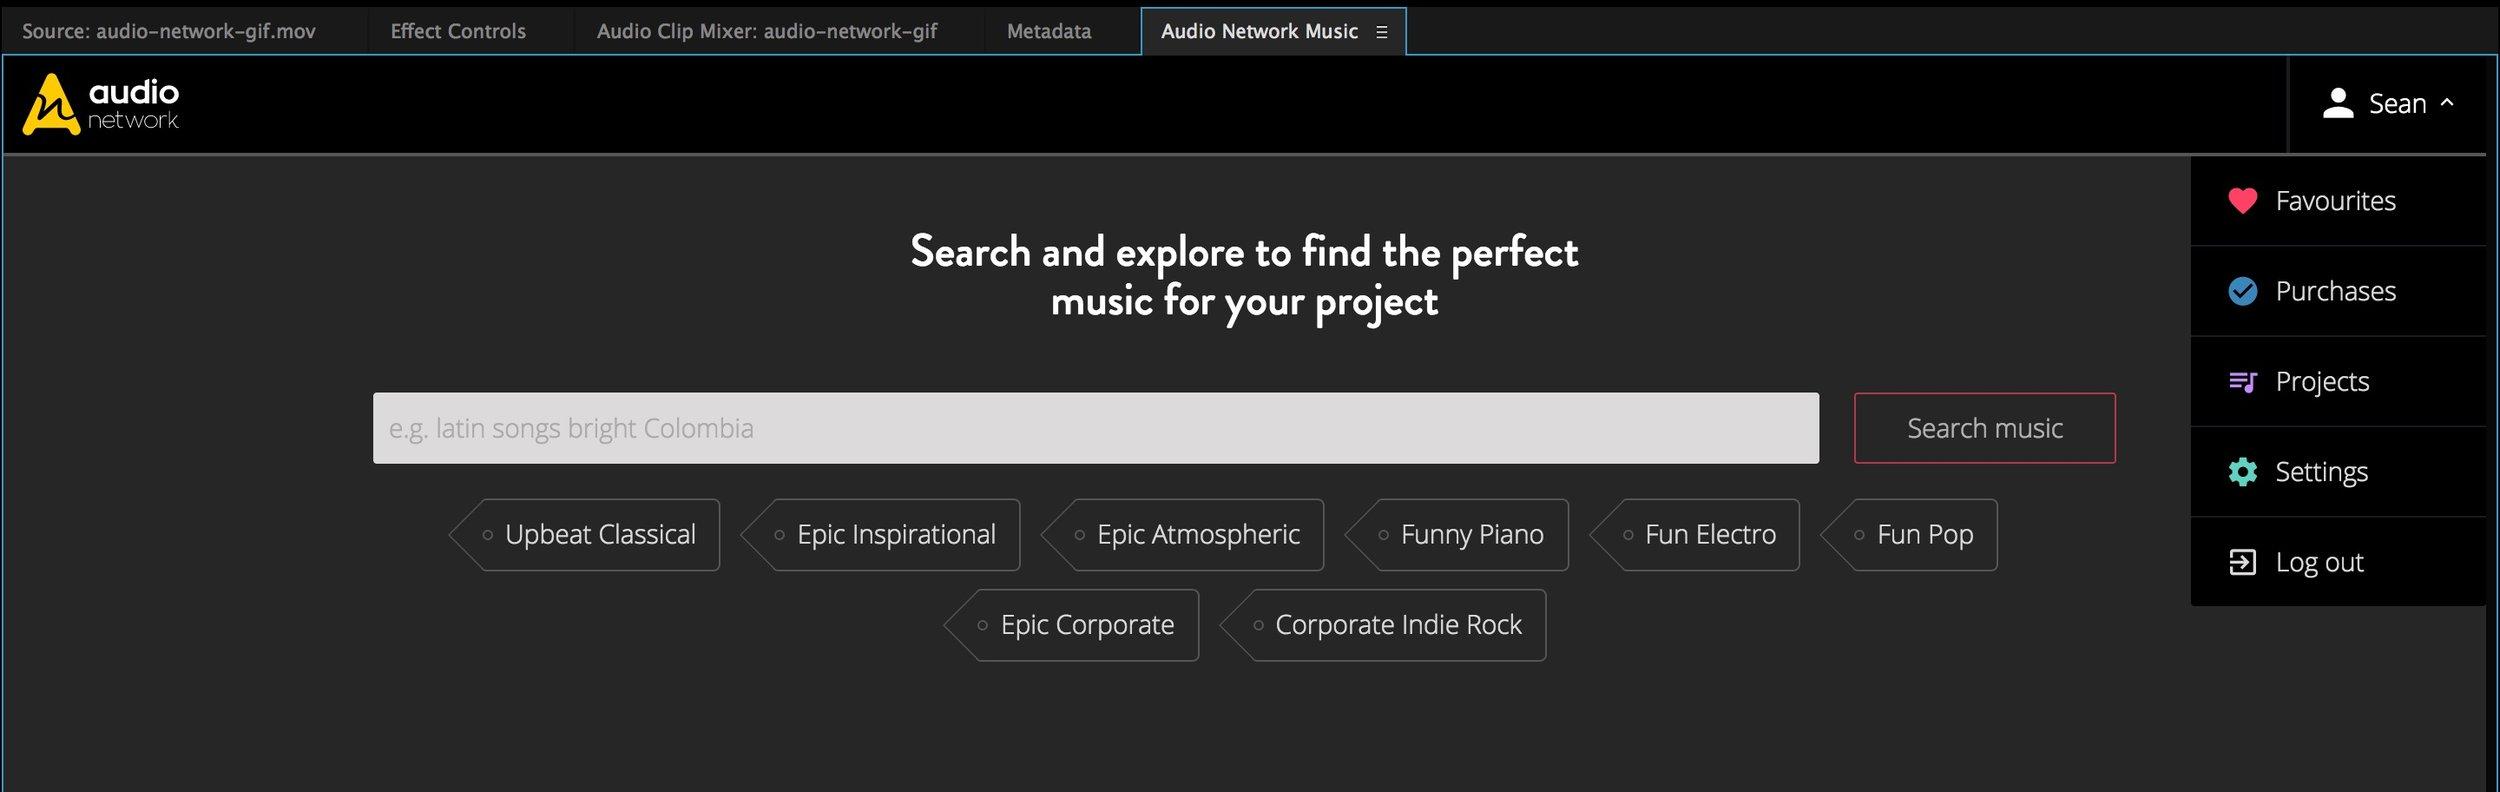 audio-network-premiere-pro-panel-home